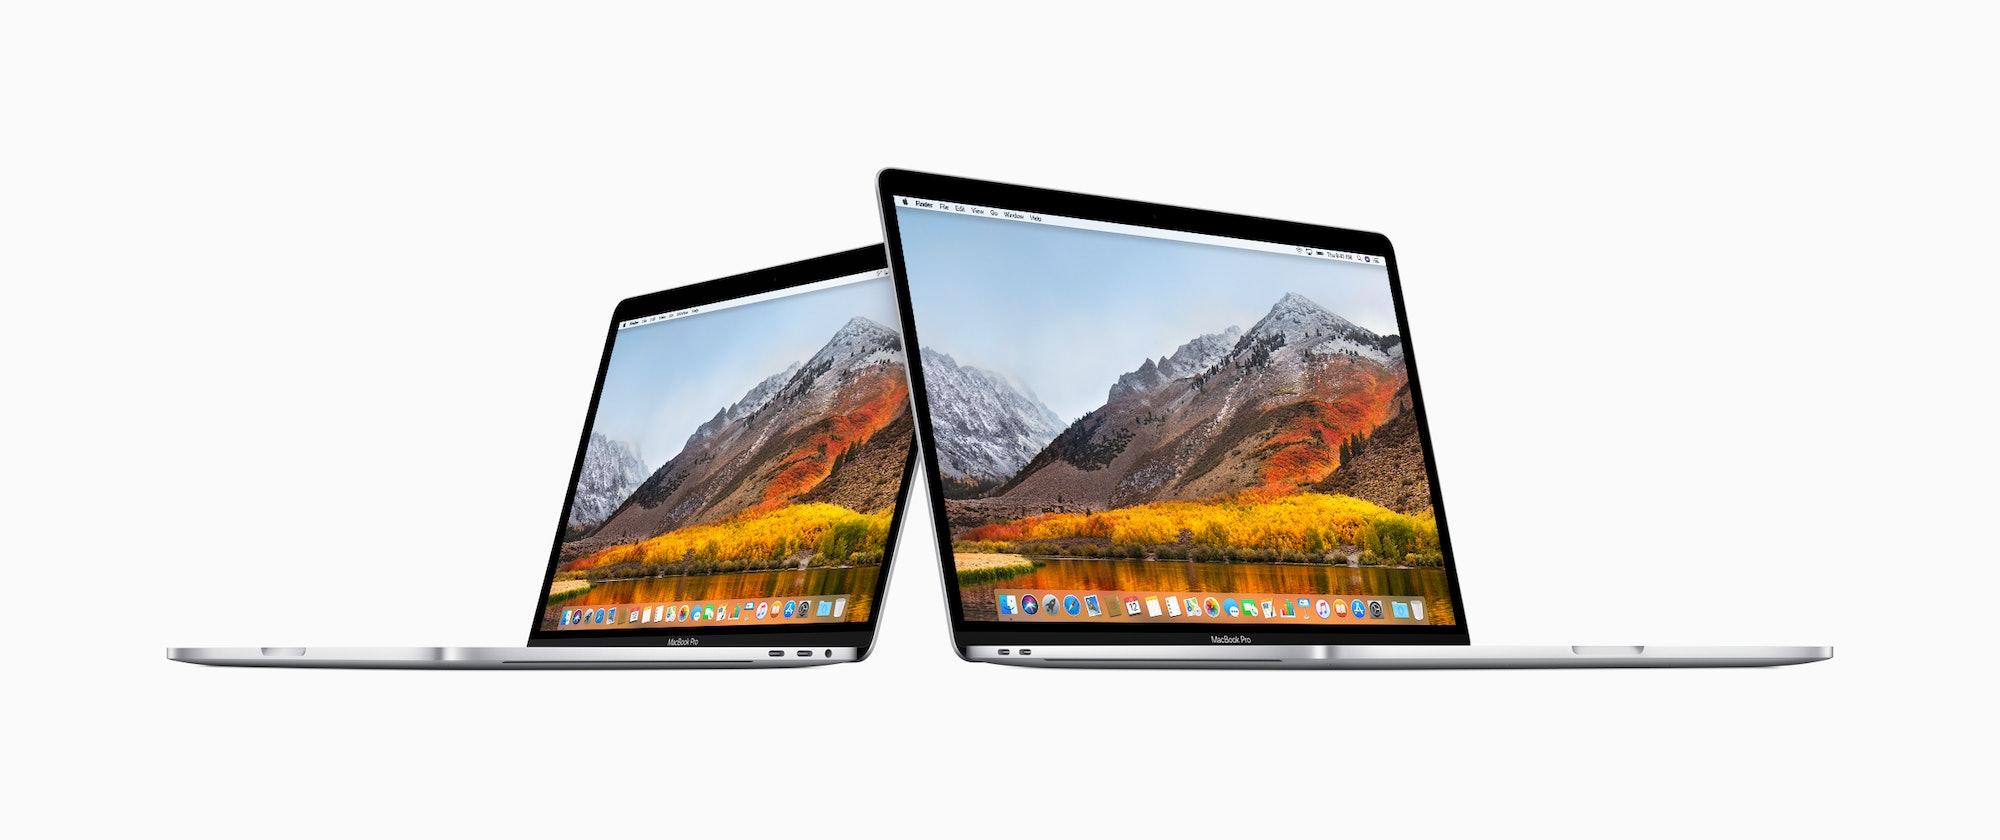 The MacBook Pro side-by-side.